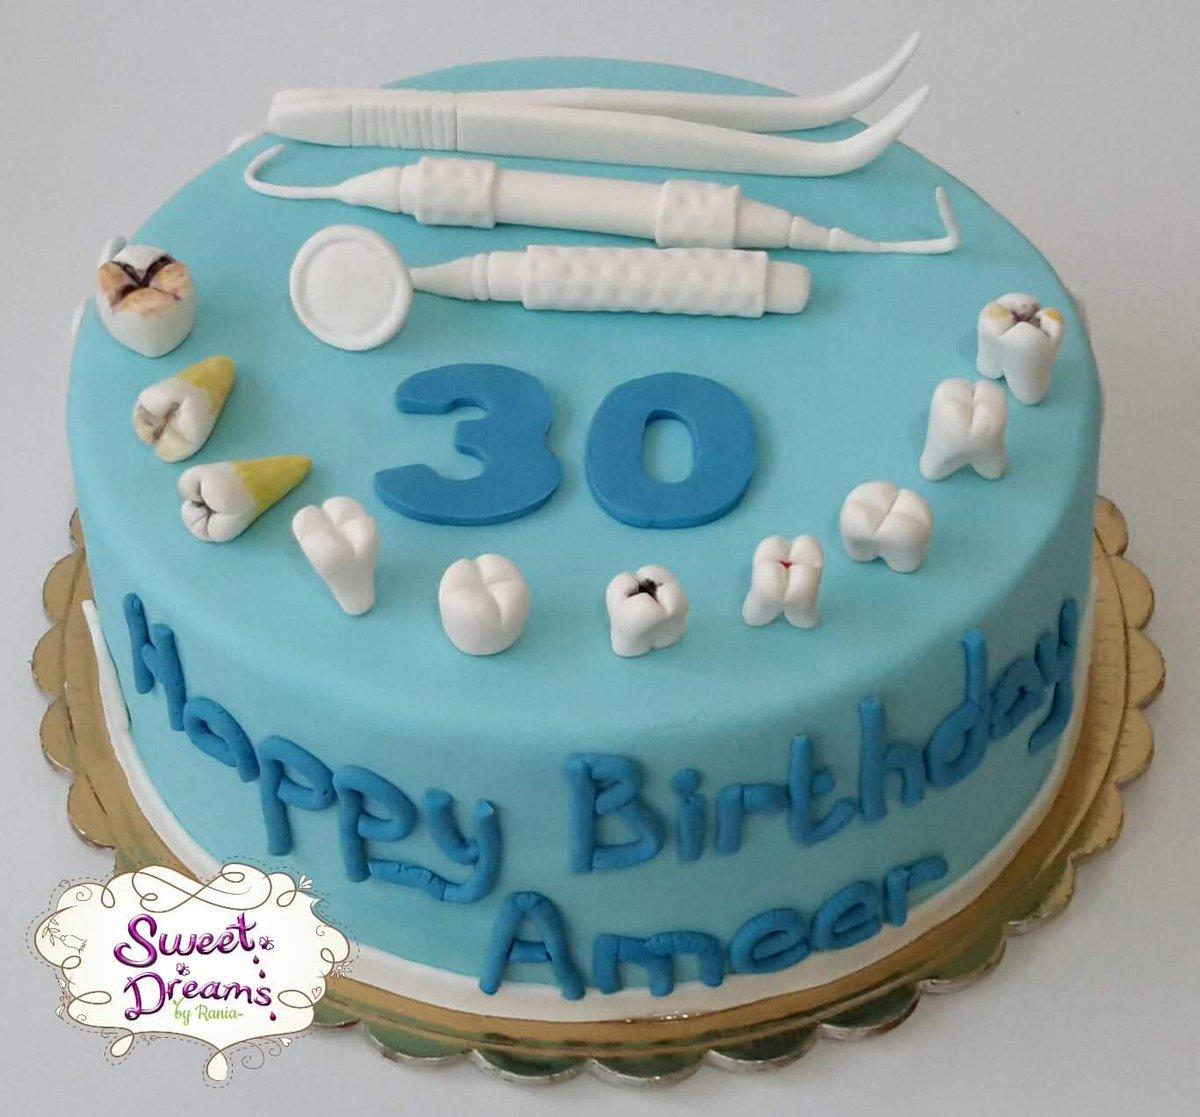 Dentist Cake Sweetdreamsbyraniapictwitter OIUaJVfiY1